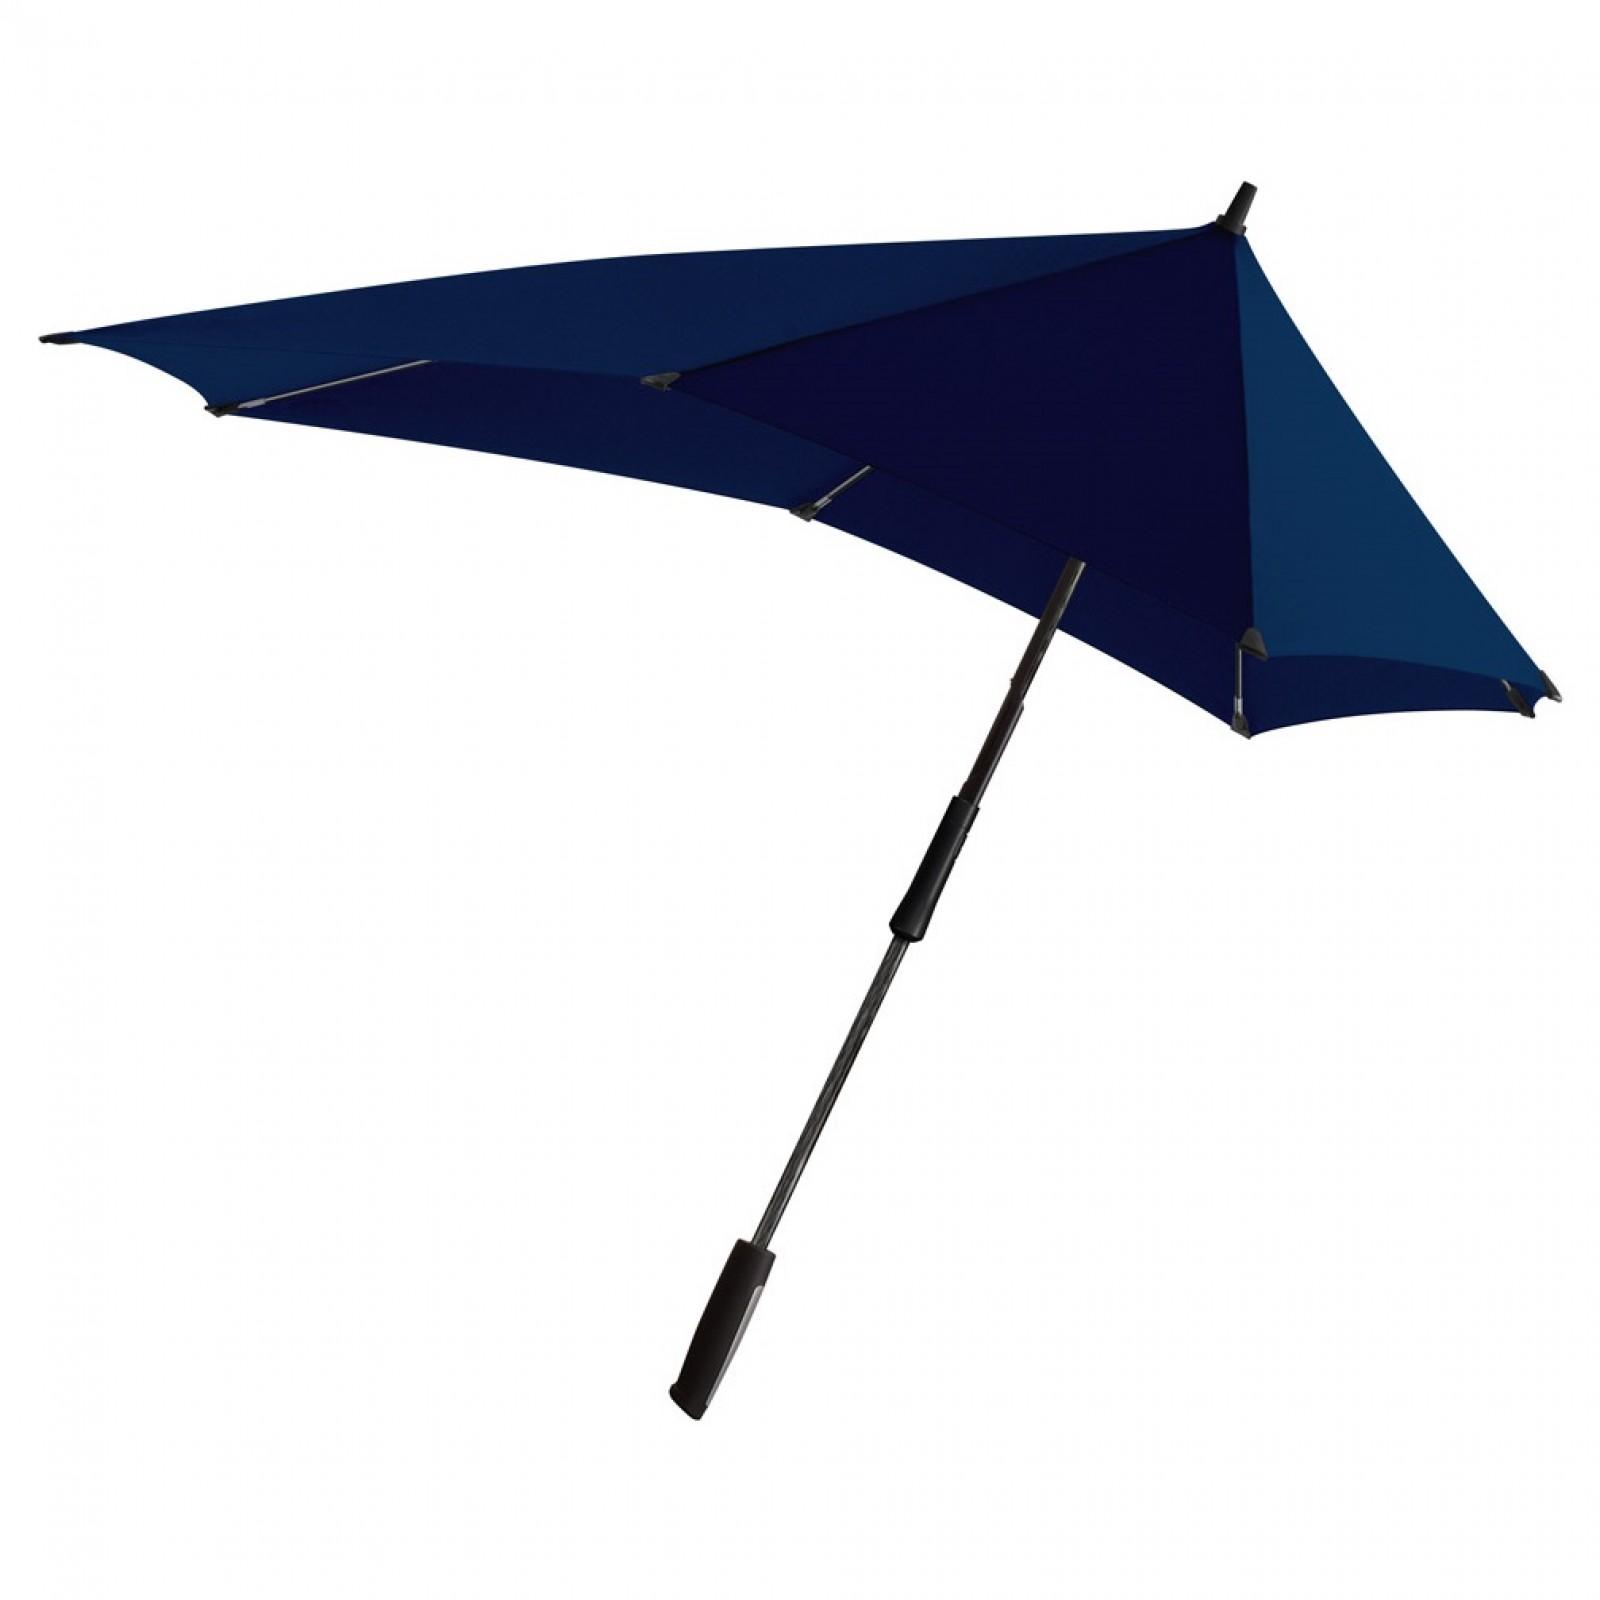 Storm Umbrella XXL (Midnight Blue) - Senz°